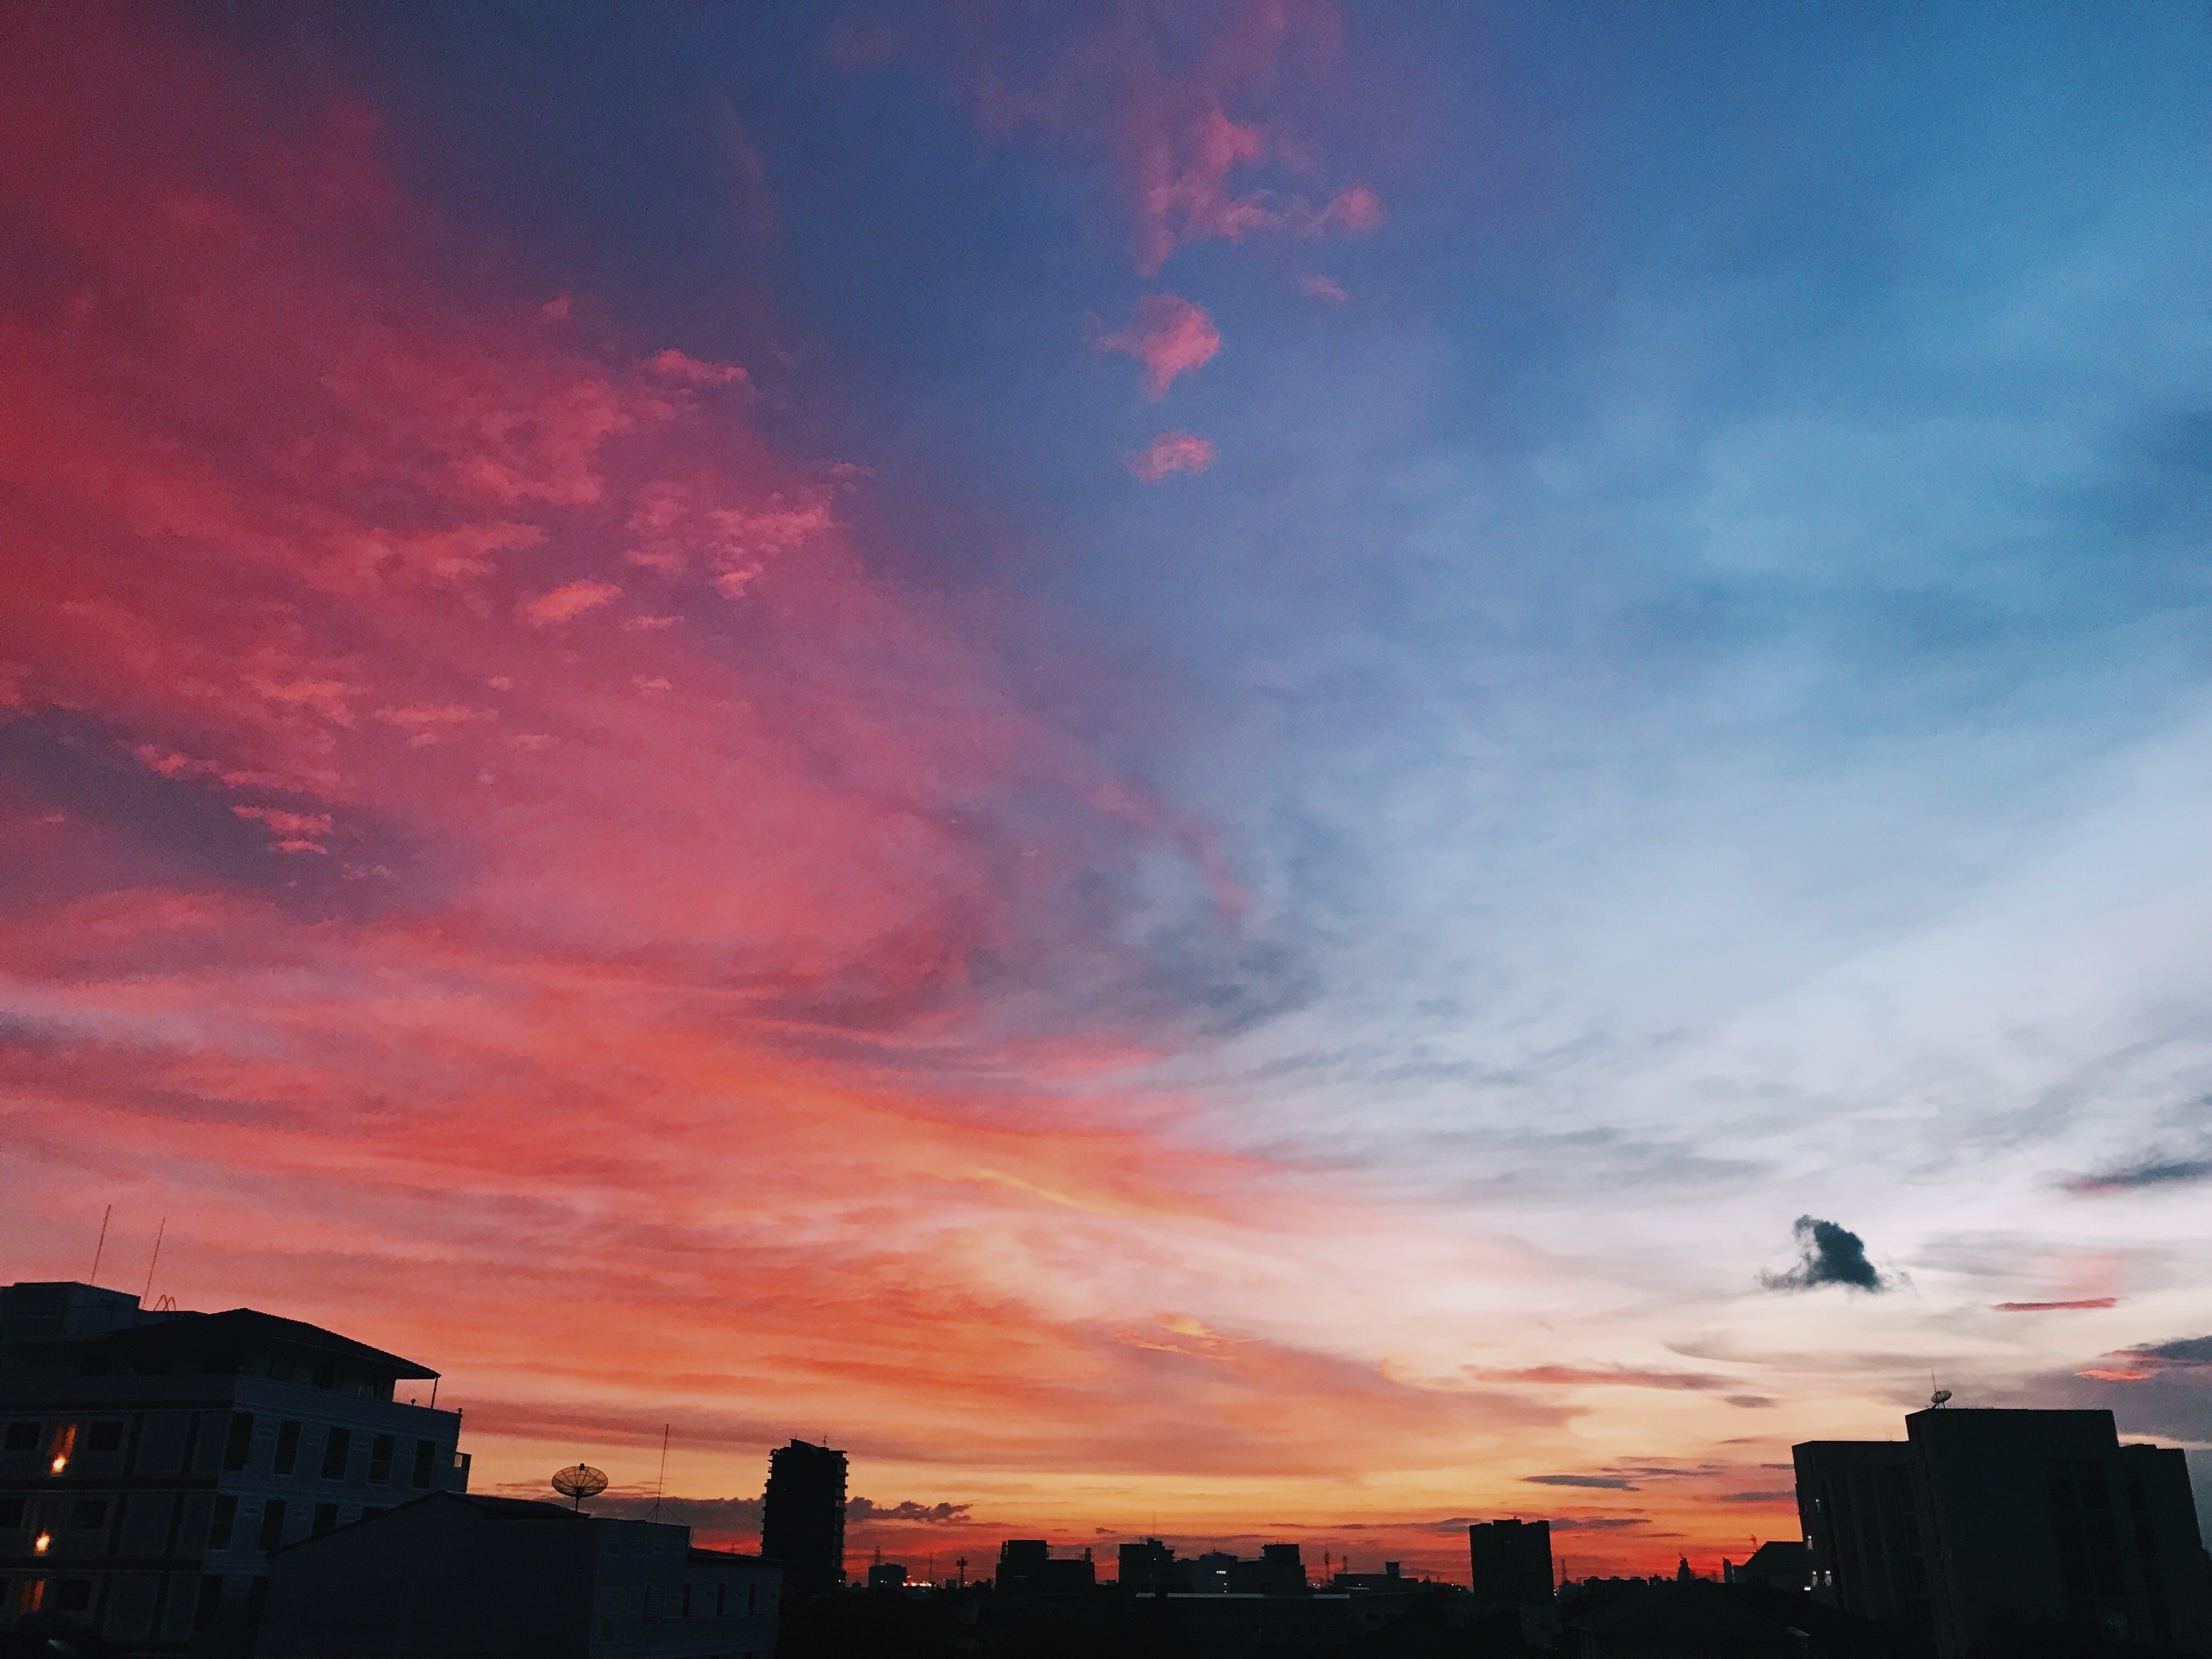 Free stock photo of #sky #candysky #sunset #nature #bangkok #thailand